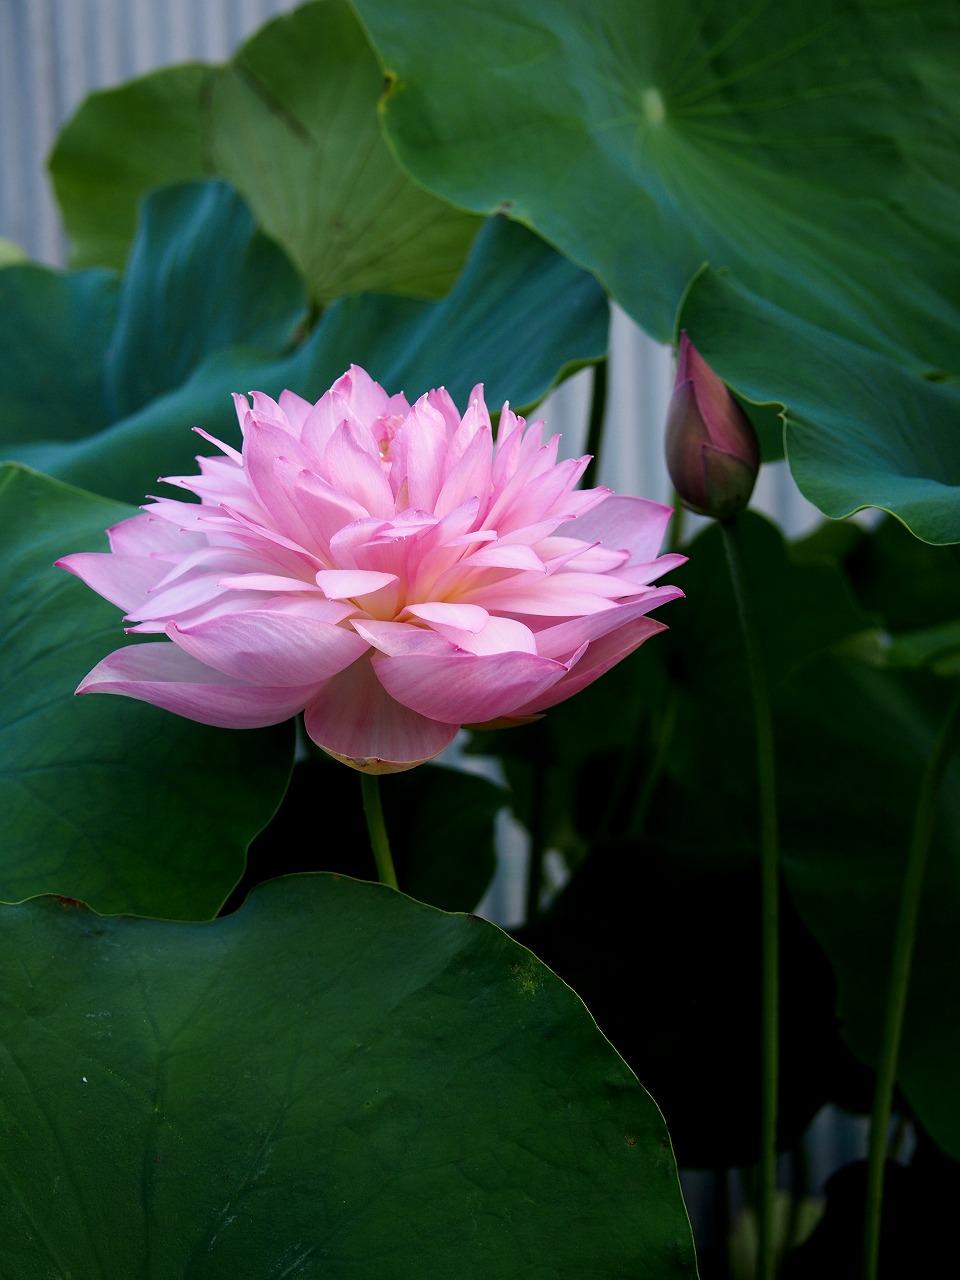 20170722-Lotus_Hishinkou-O01.jpg